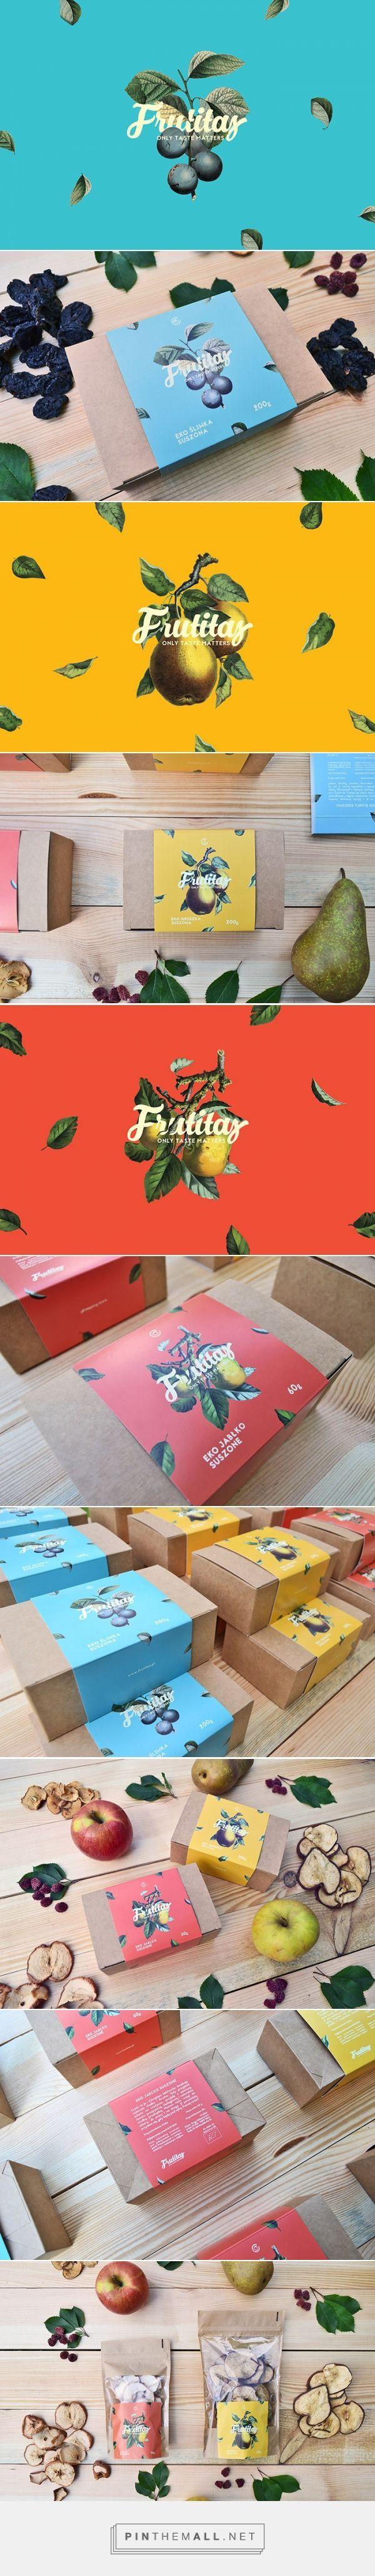 FRUTITAS processed fruit by PARIS+HENDZEL STUDIO. Pin curated by #SFields99 #packaging #design